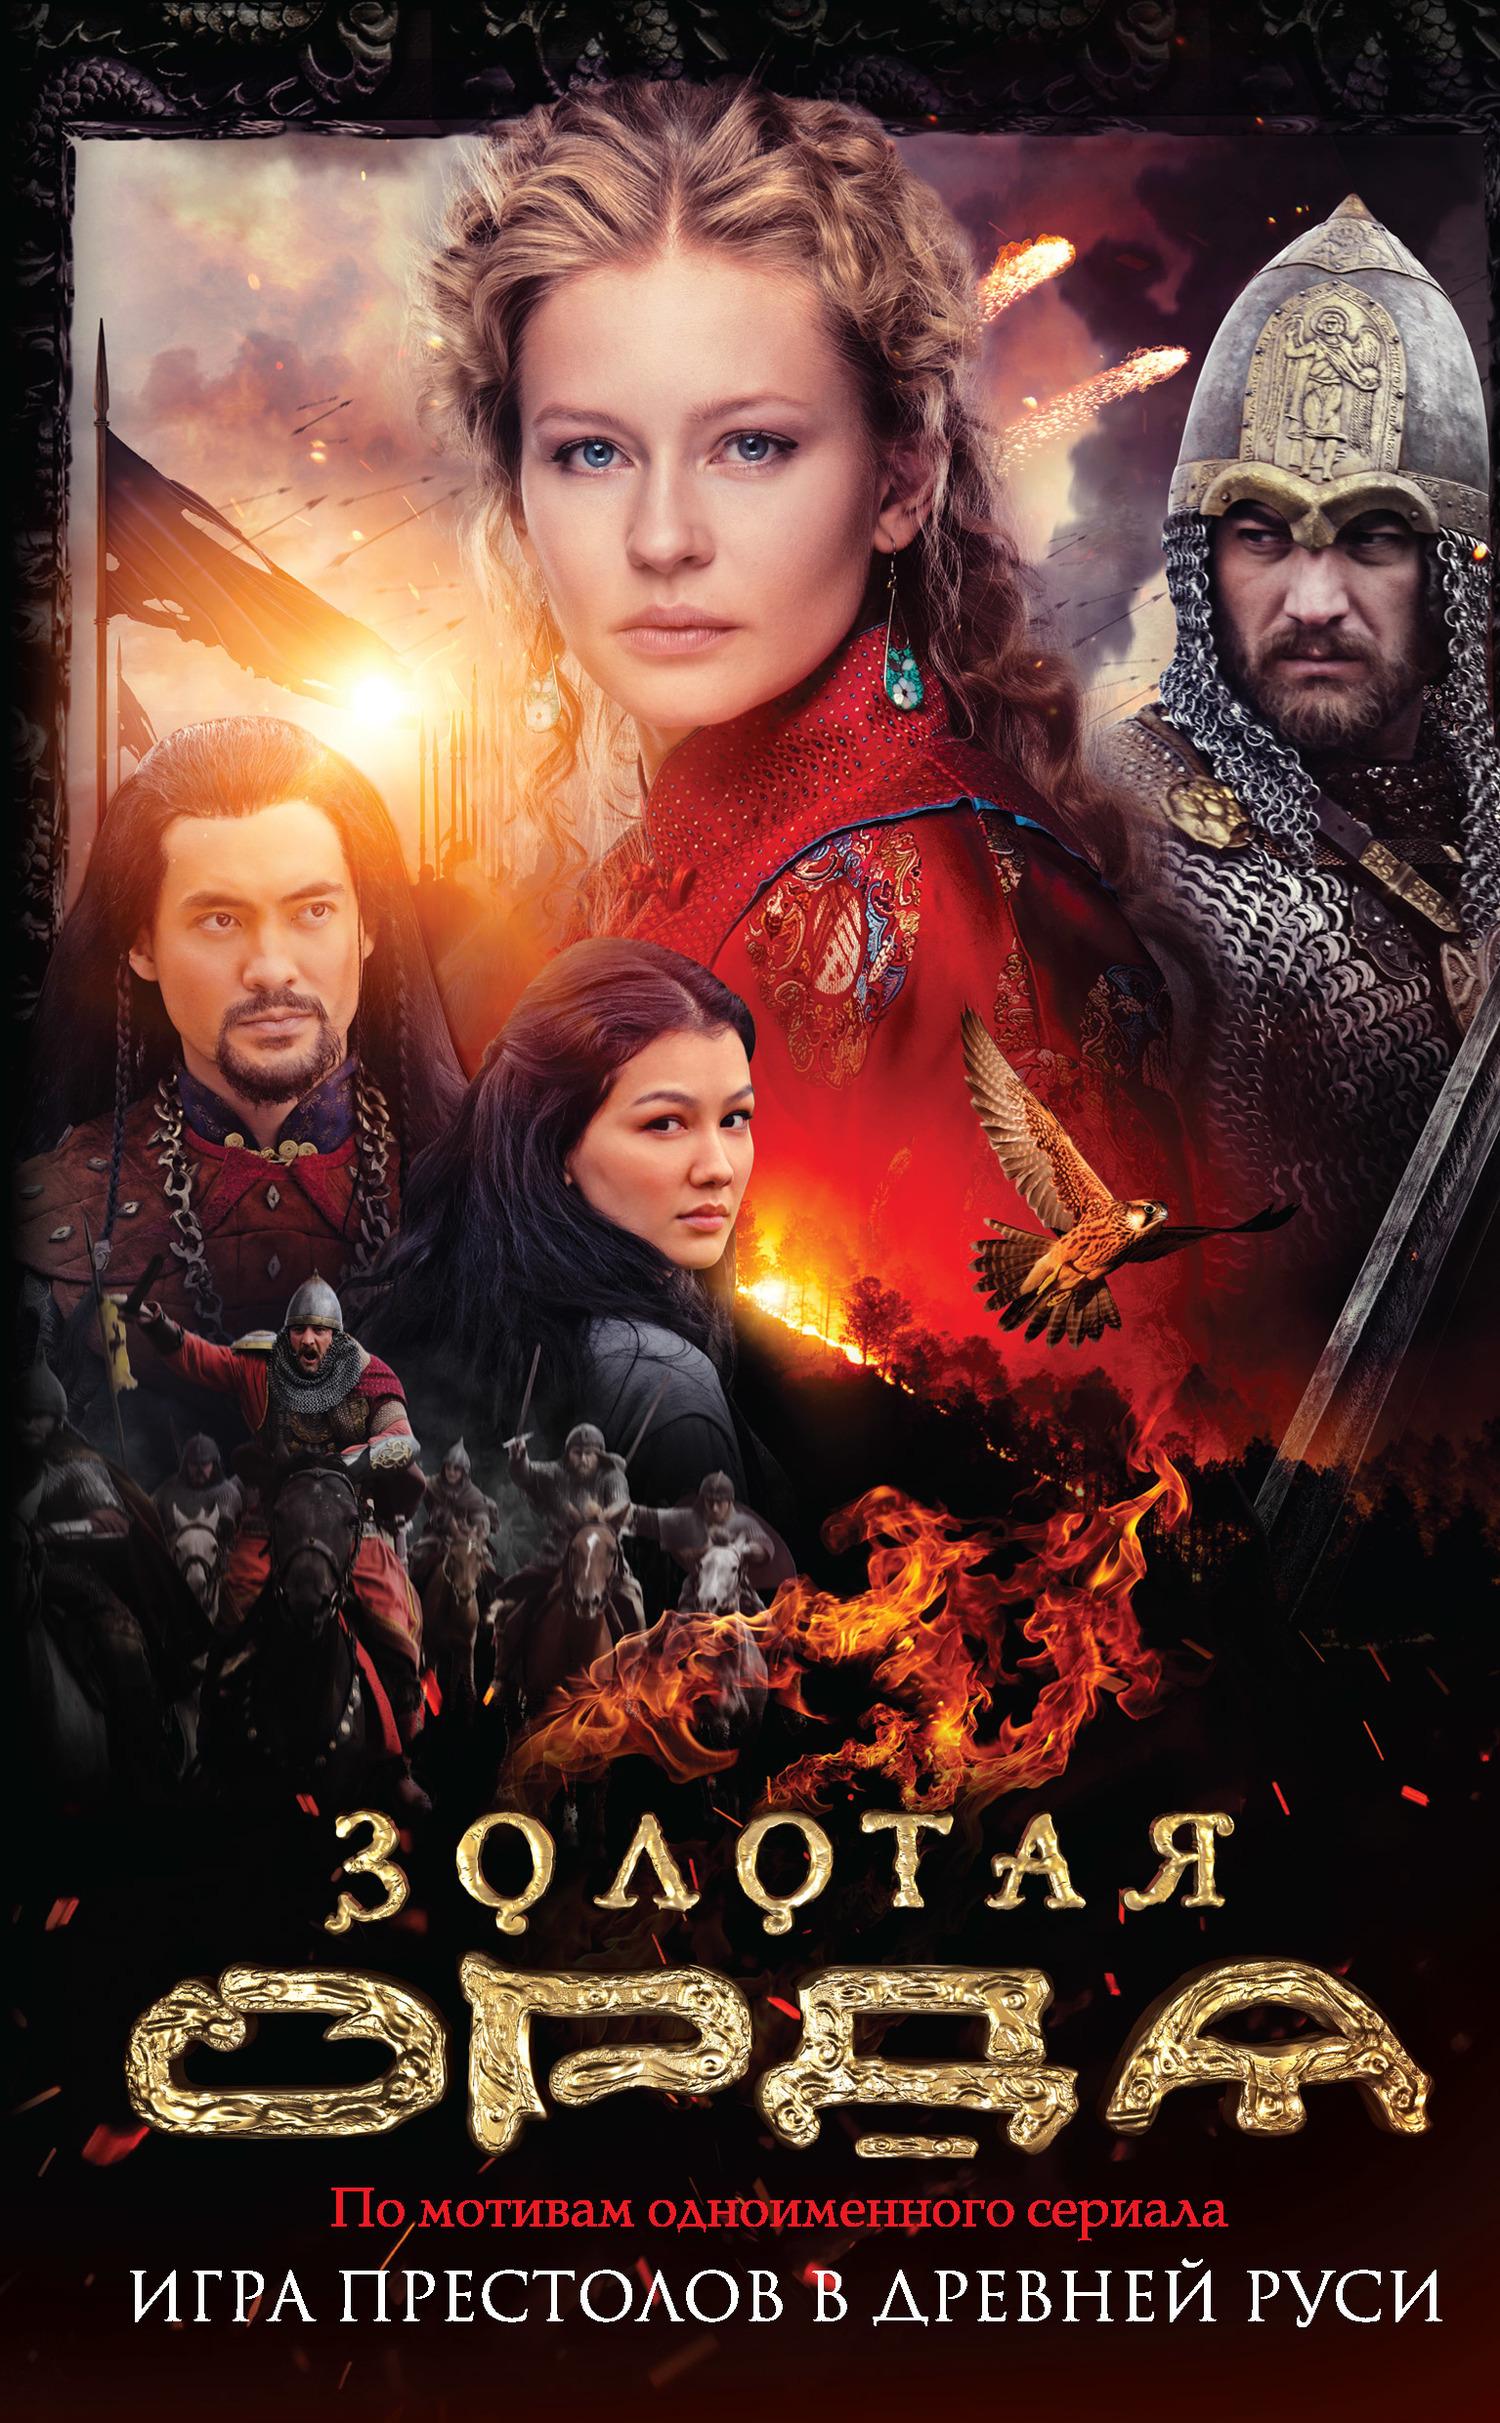 Борис Глебов. Золотая Орда